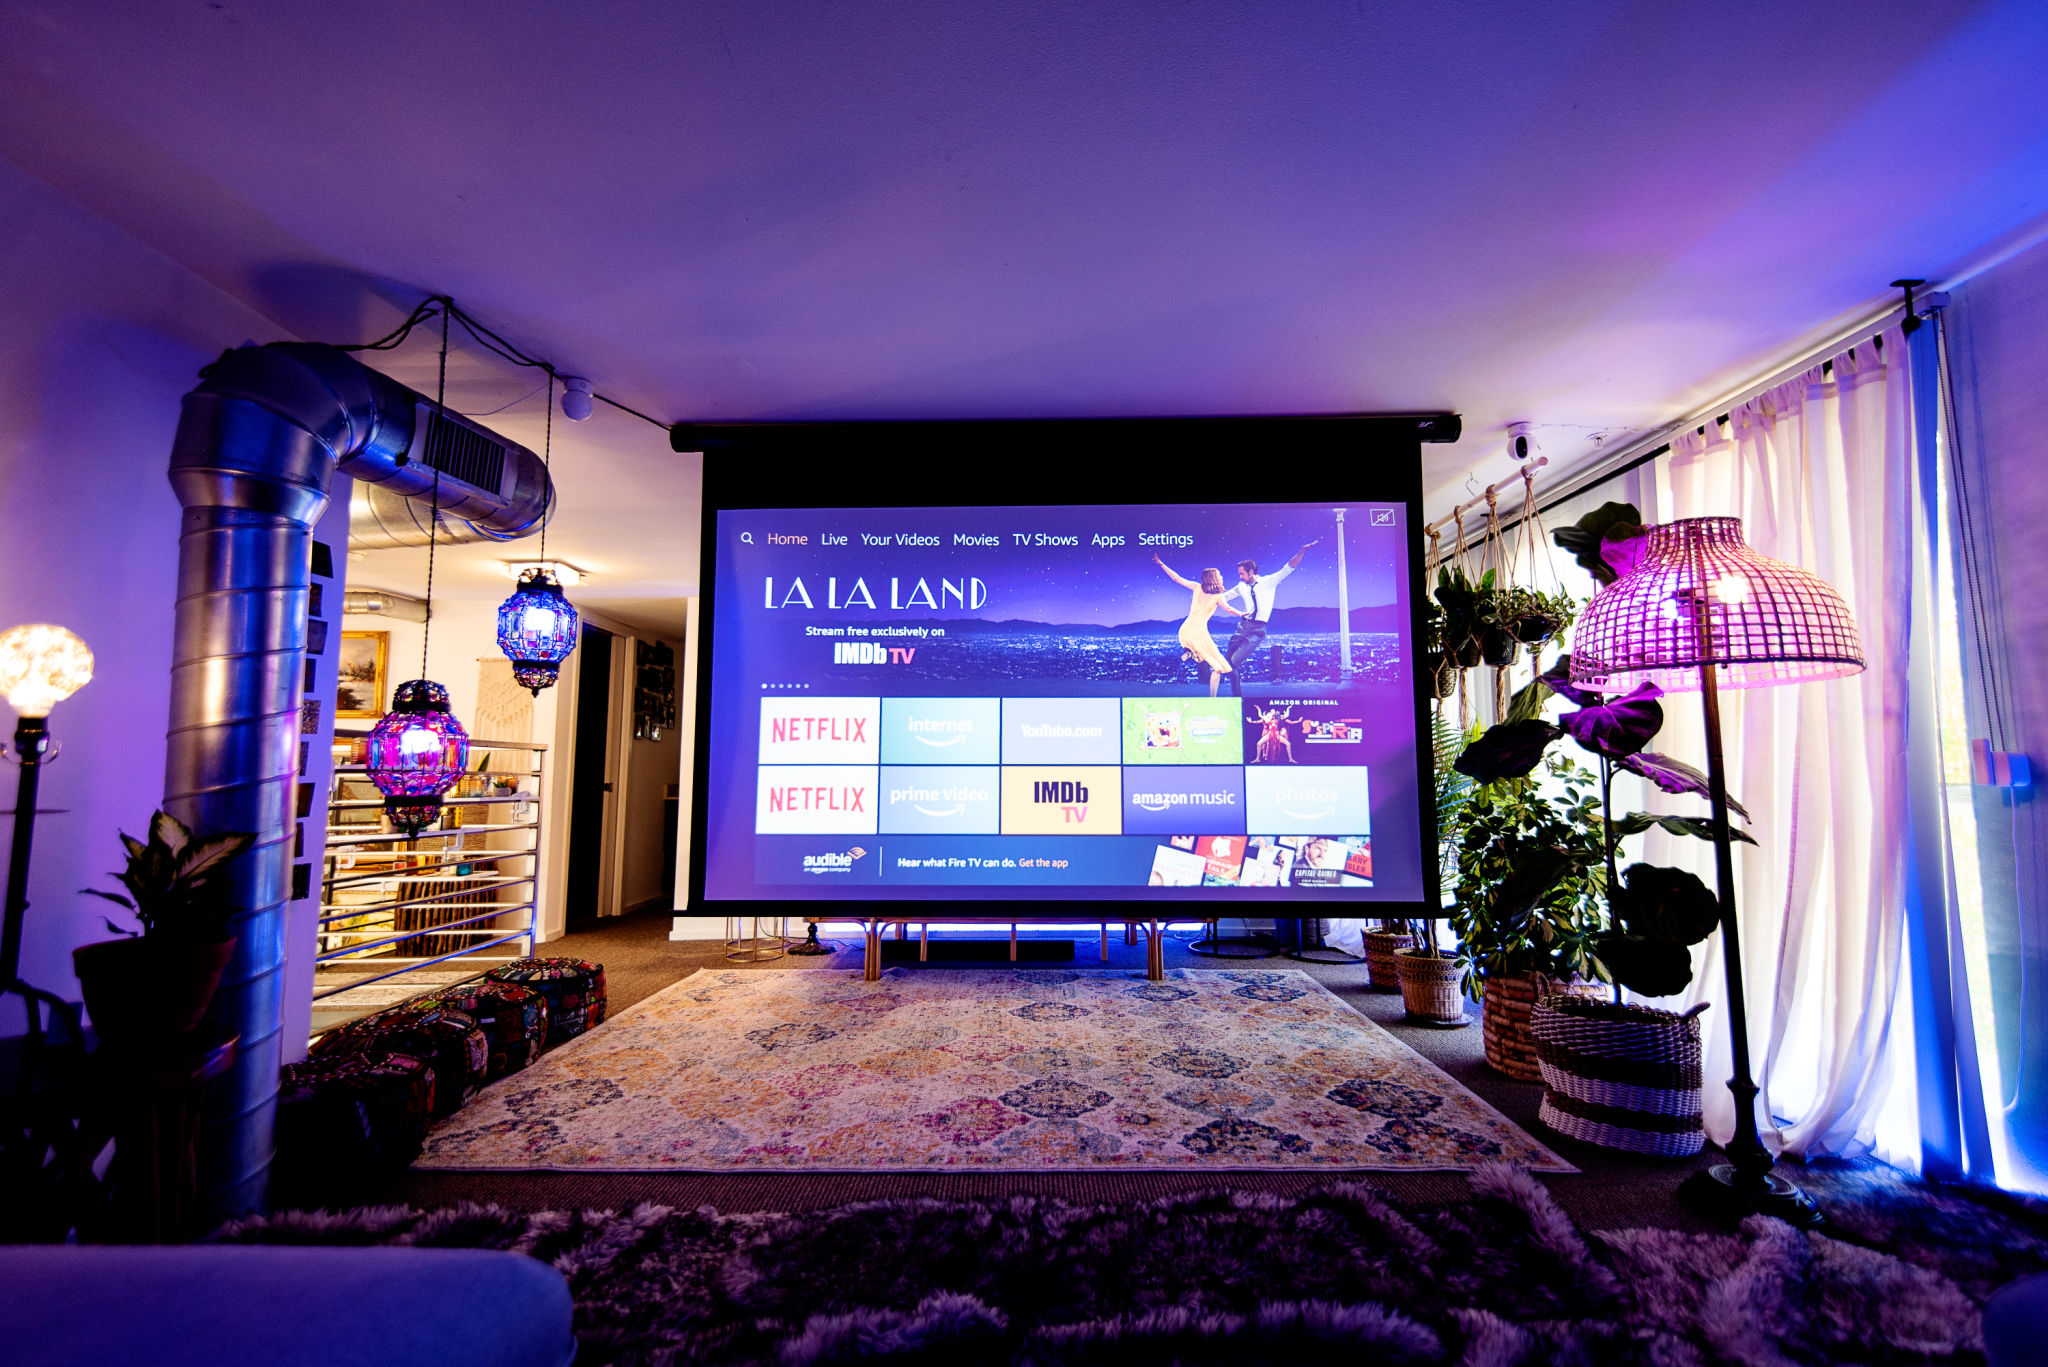 2300 sq ft luxury studio loft w/ natural light, patio, plants and foliage